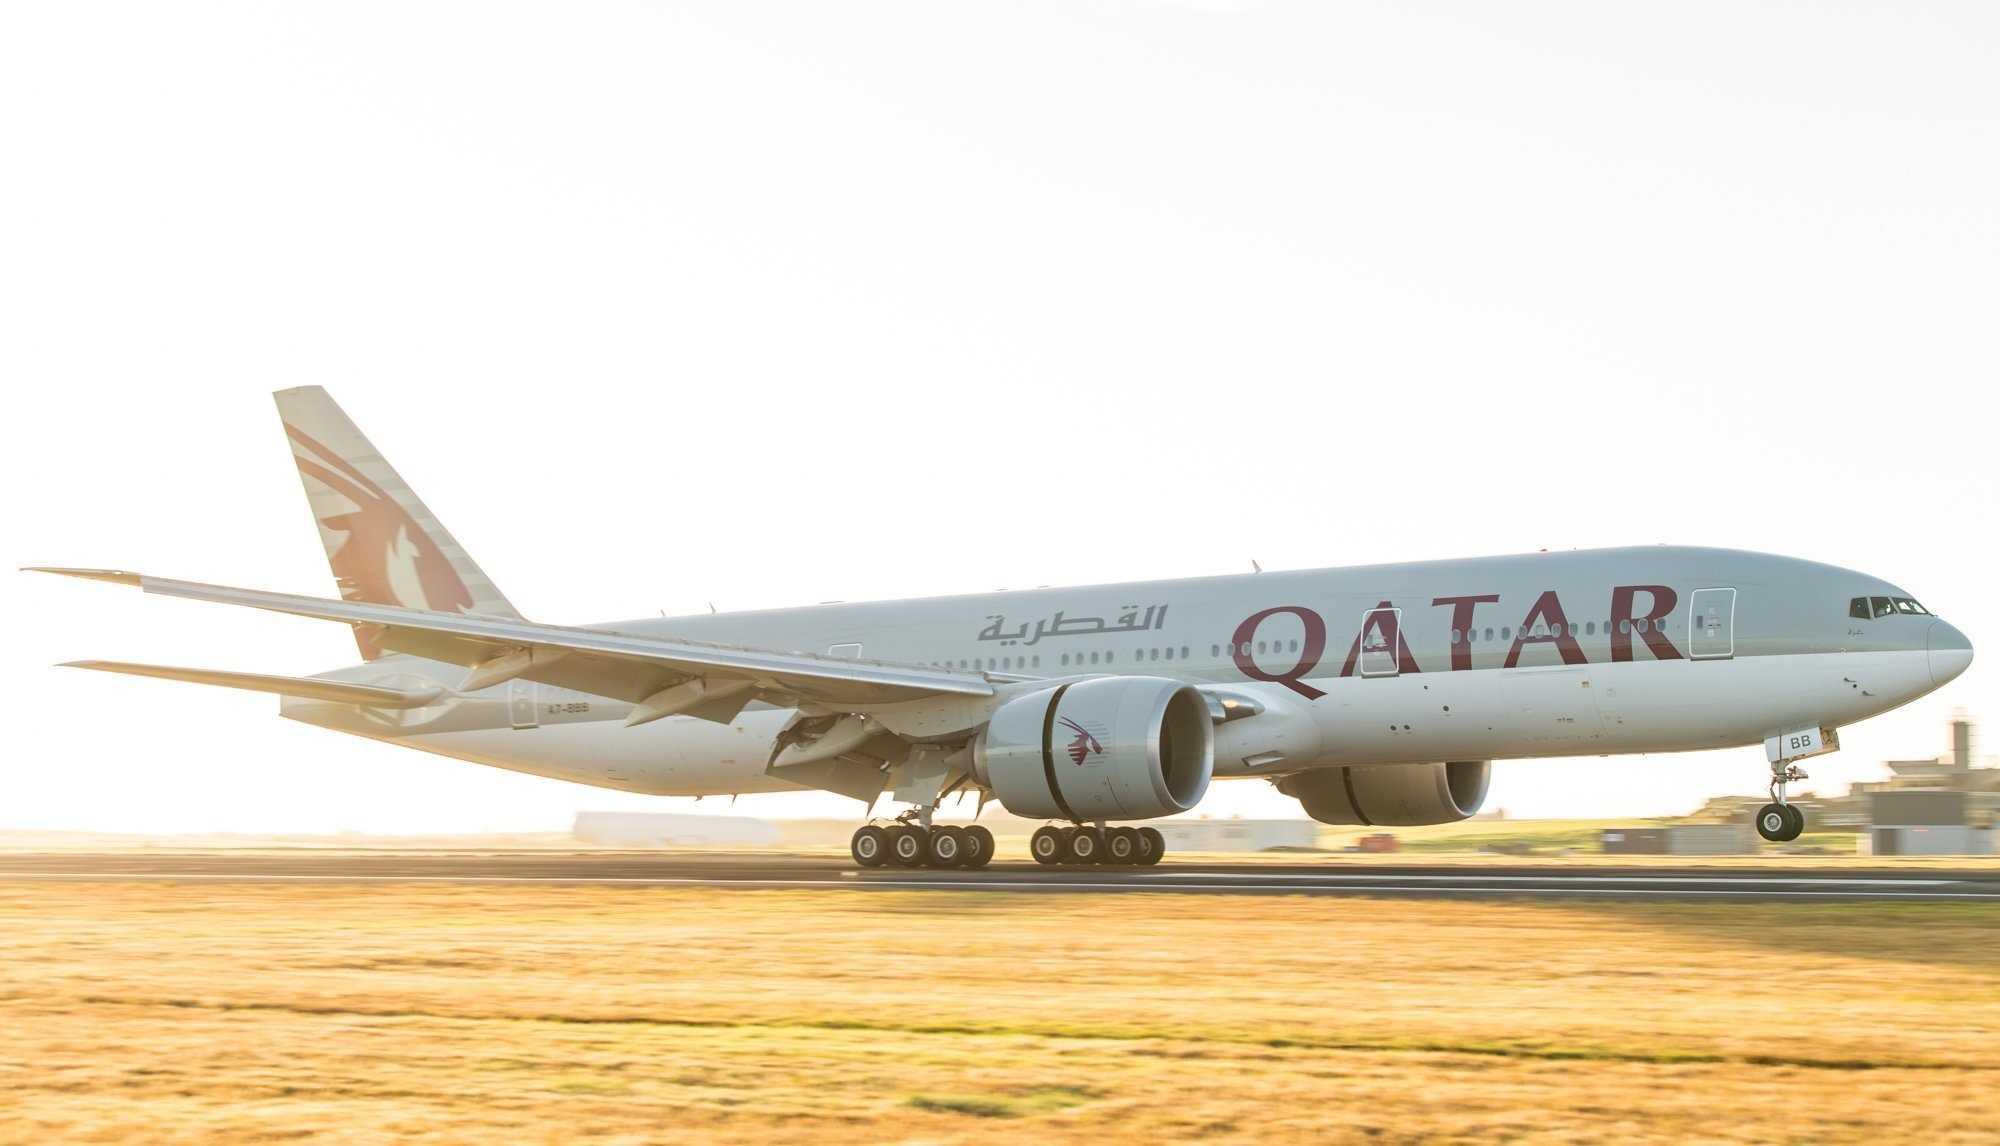 Gulf Mediator Says Qatar `Ready to Understand' Region's Concerns